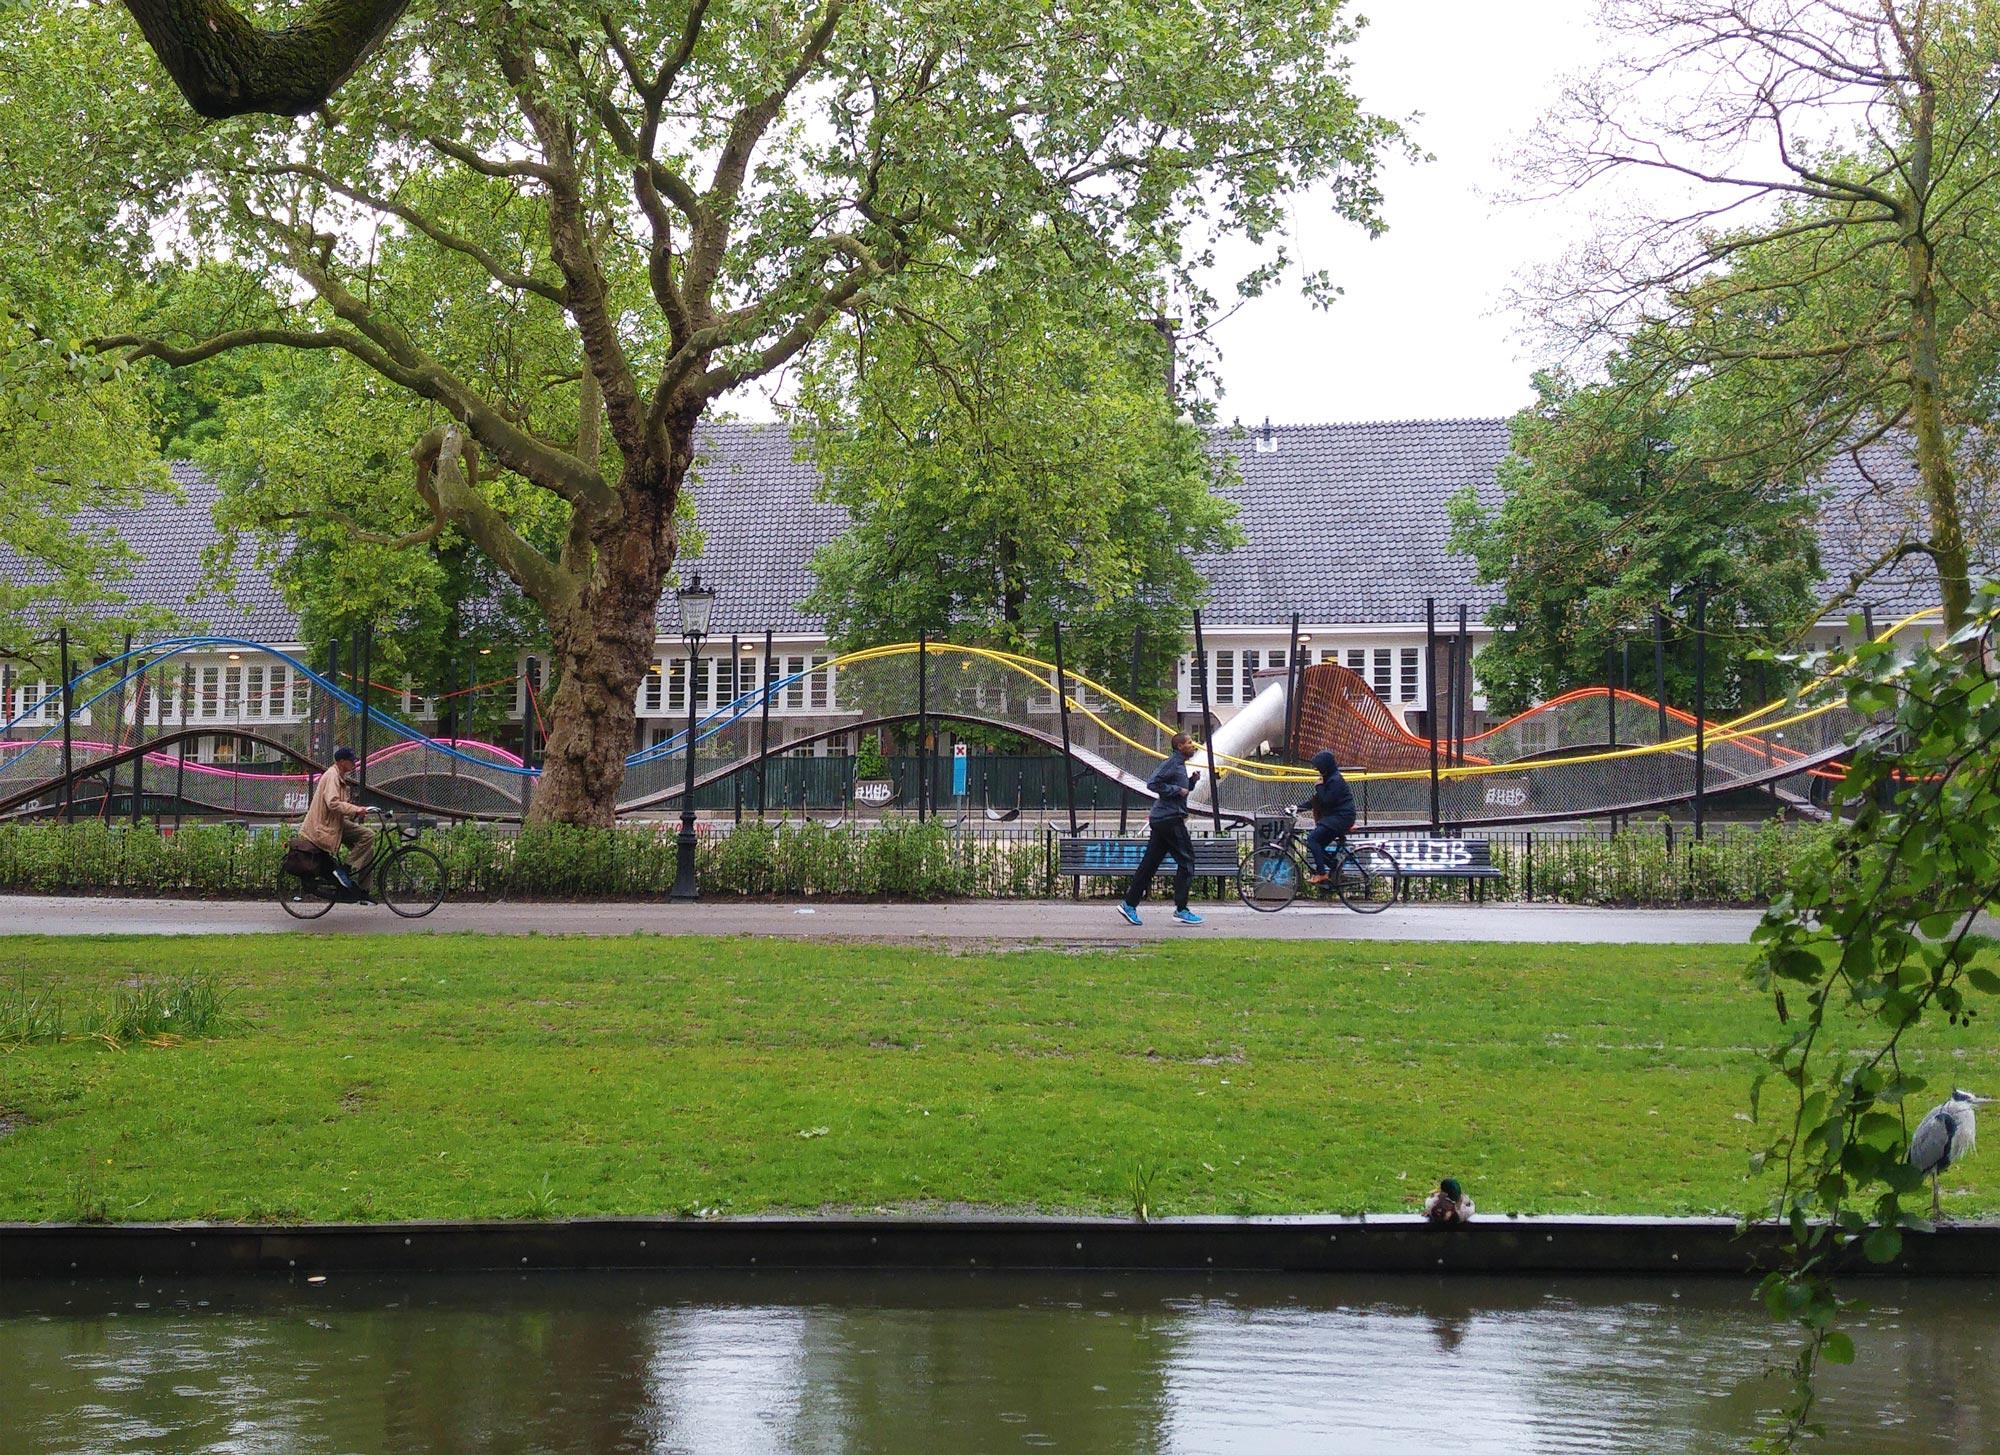 urbanbacklog-amsterdam-oosterpark-play-garland-1.jpg